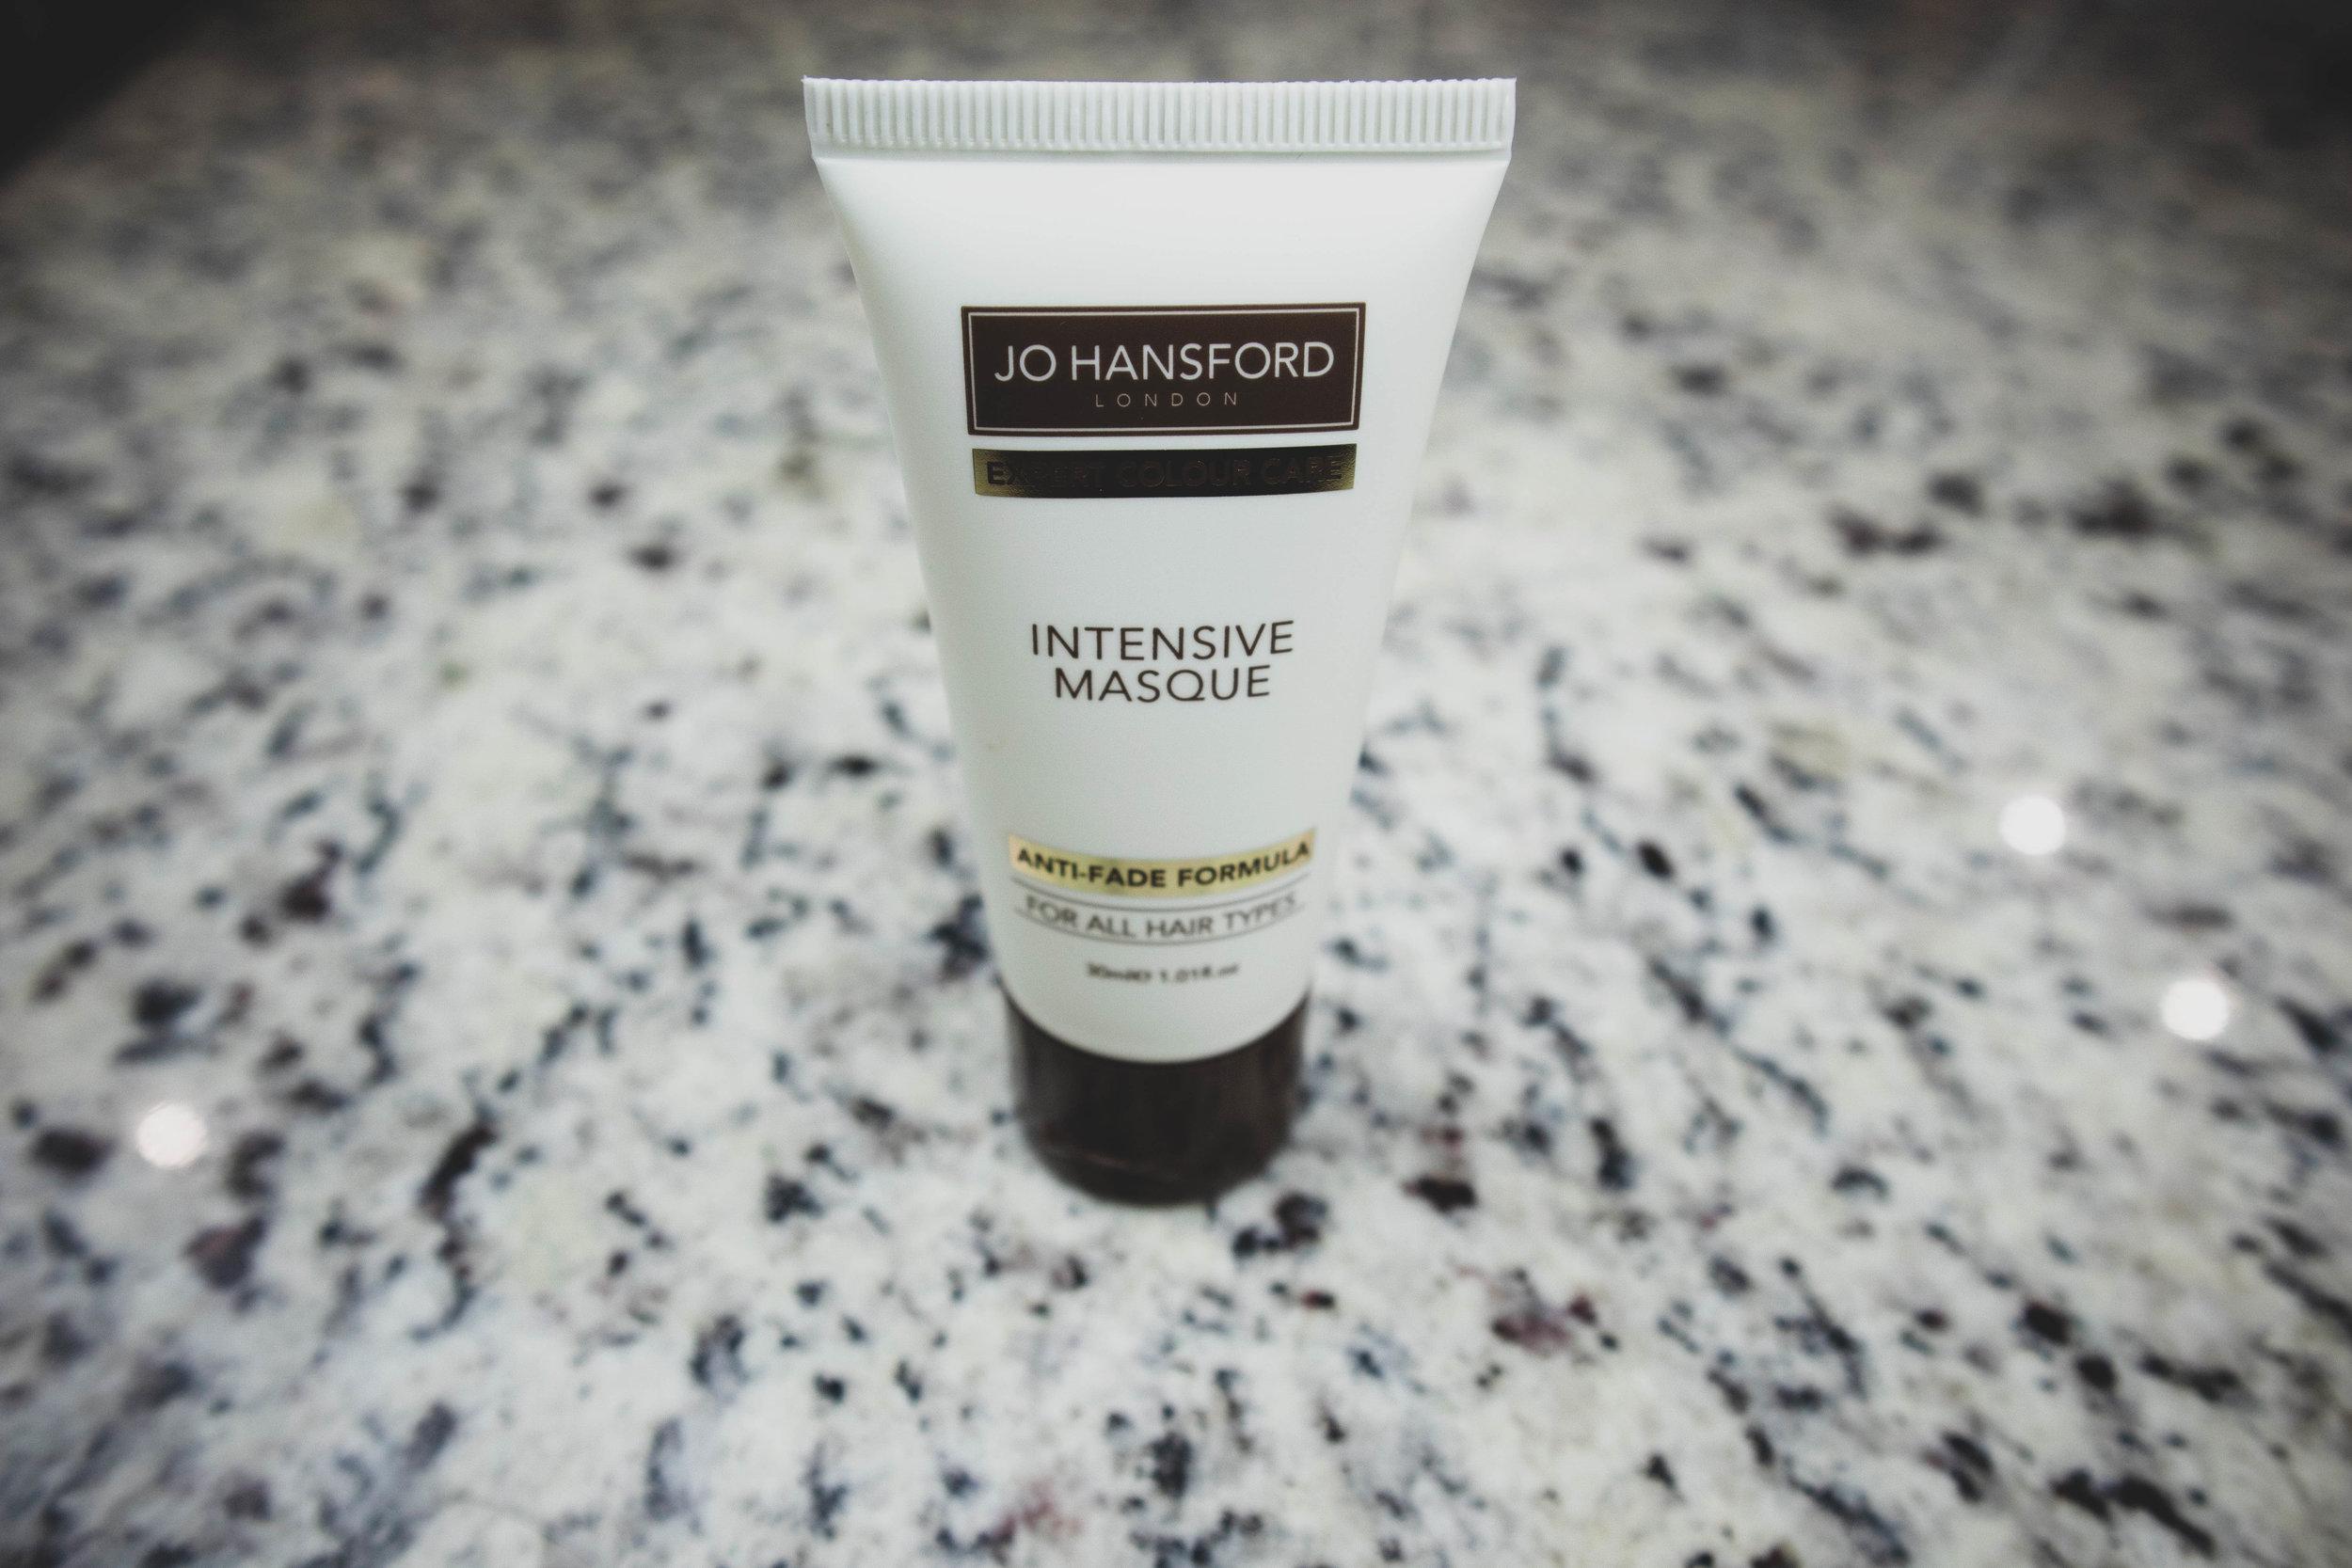 Jo Hansford - London - Expert Colour Care Intensive Masque